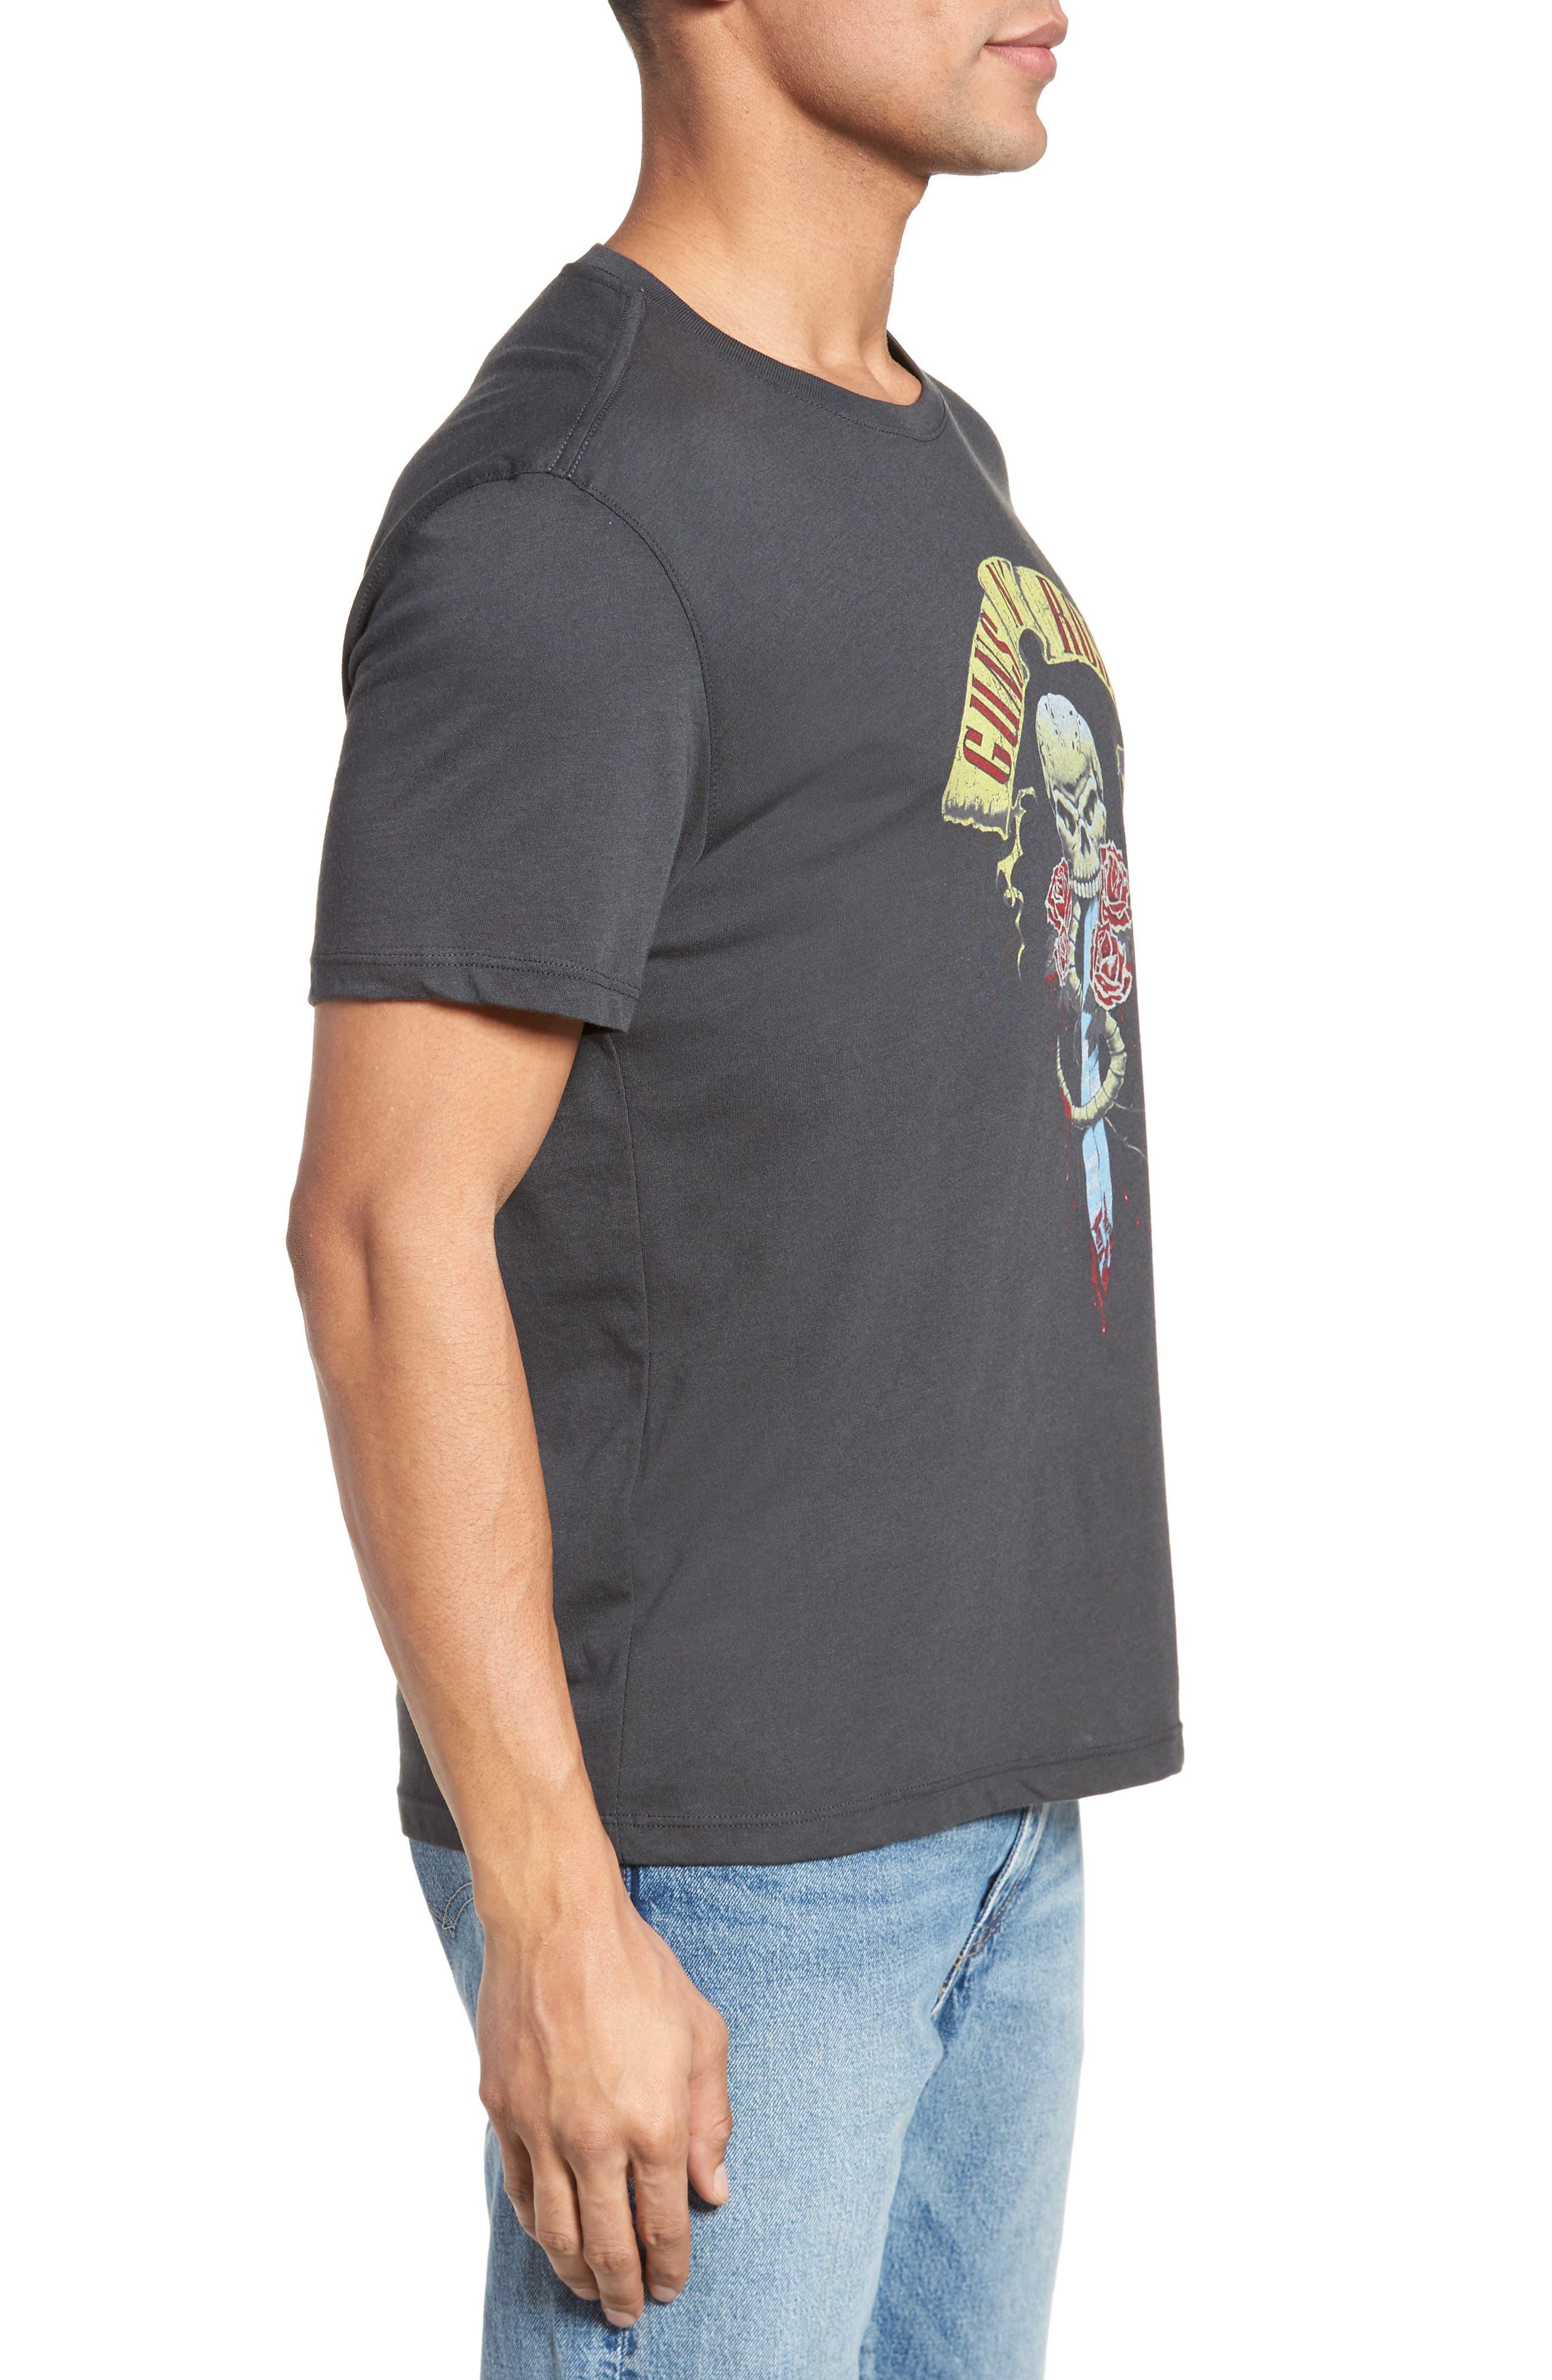 Guns N' Roses Graphic T-Shirt,                             Alternate thumbnail 3, color,                             Coal